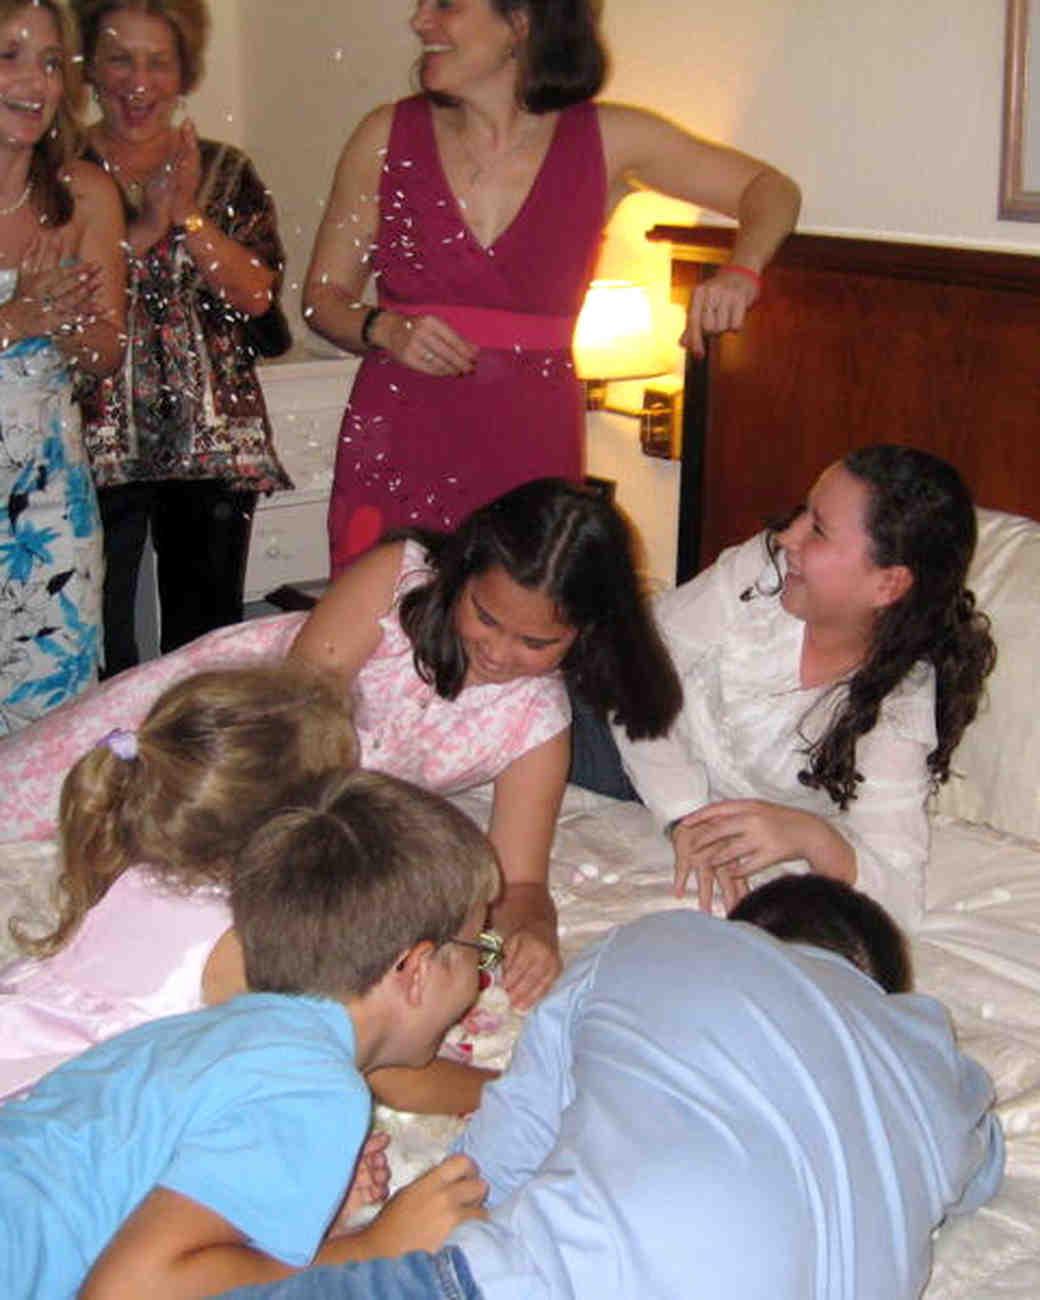 cultural-prewedding-celebrations-making-of-the-bed-greece-kids-1014.jpg